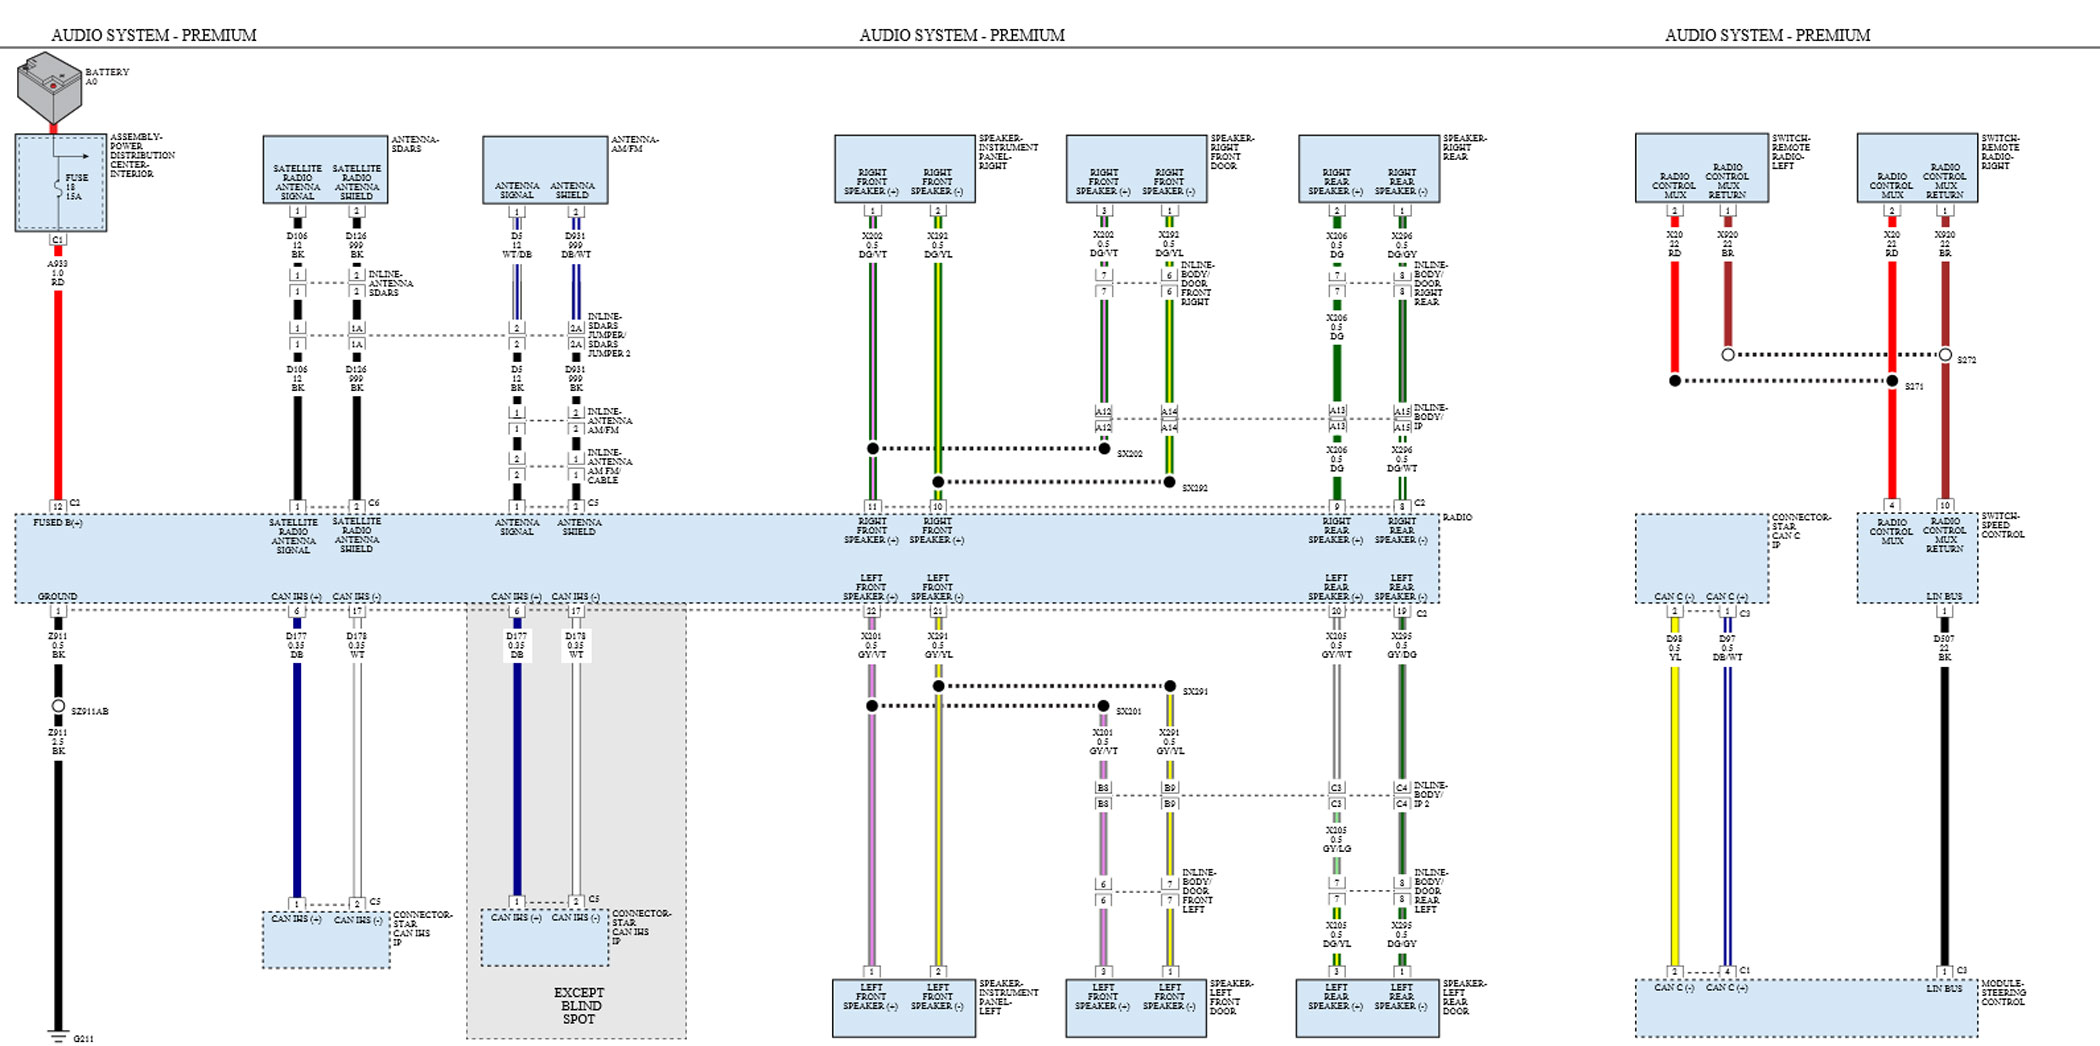 adding lc7i to 8 4 6 speaker system questions rh dodge dart org 2014 dodge dart radio wiring diagram 2015 dodge dart radio wiring diagram